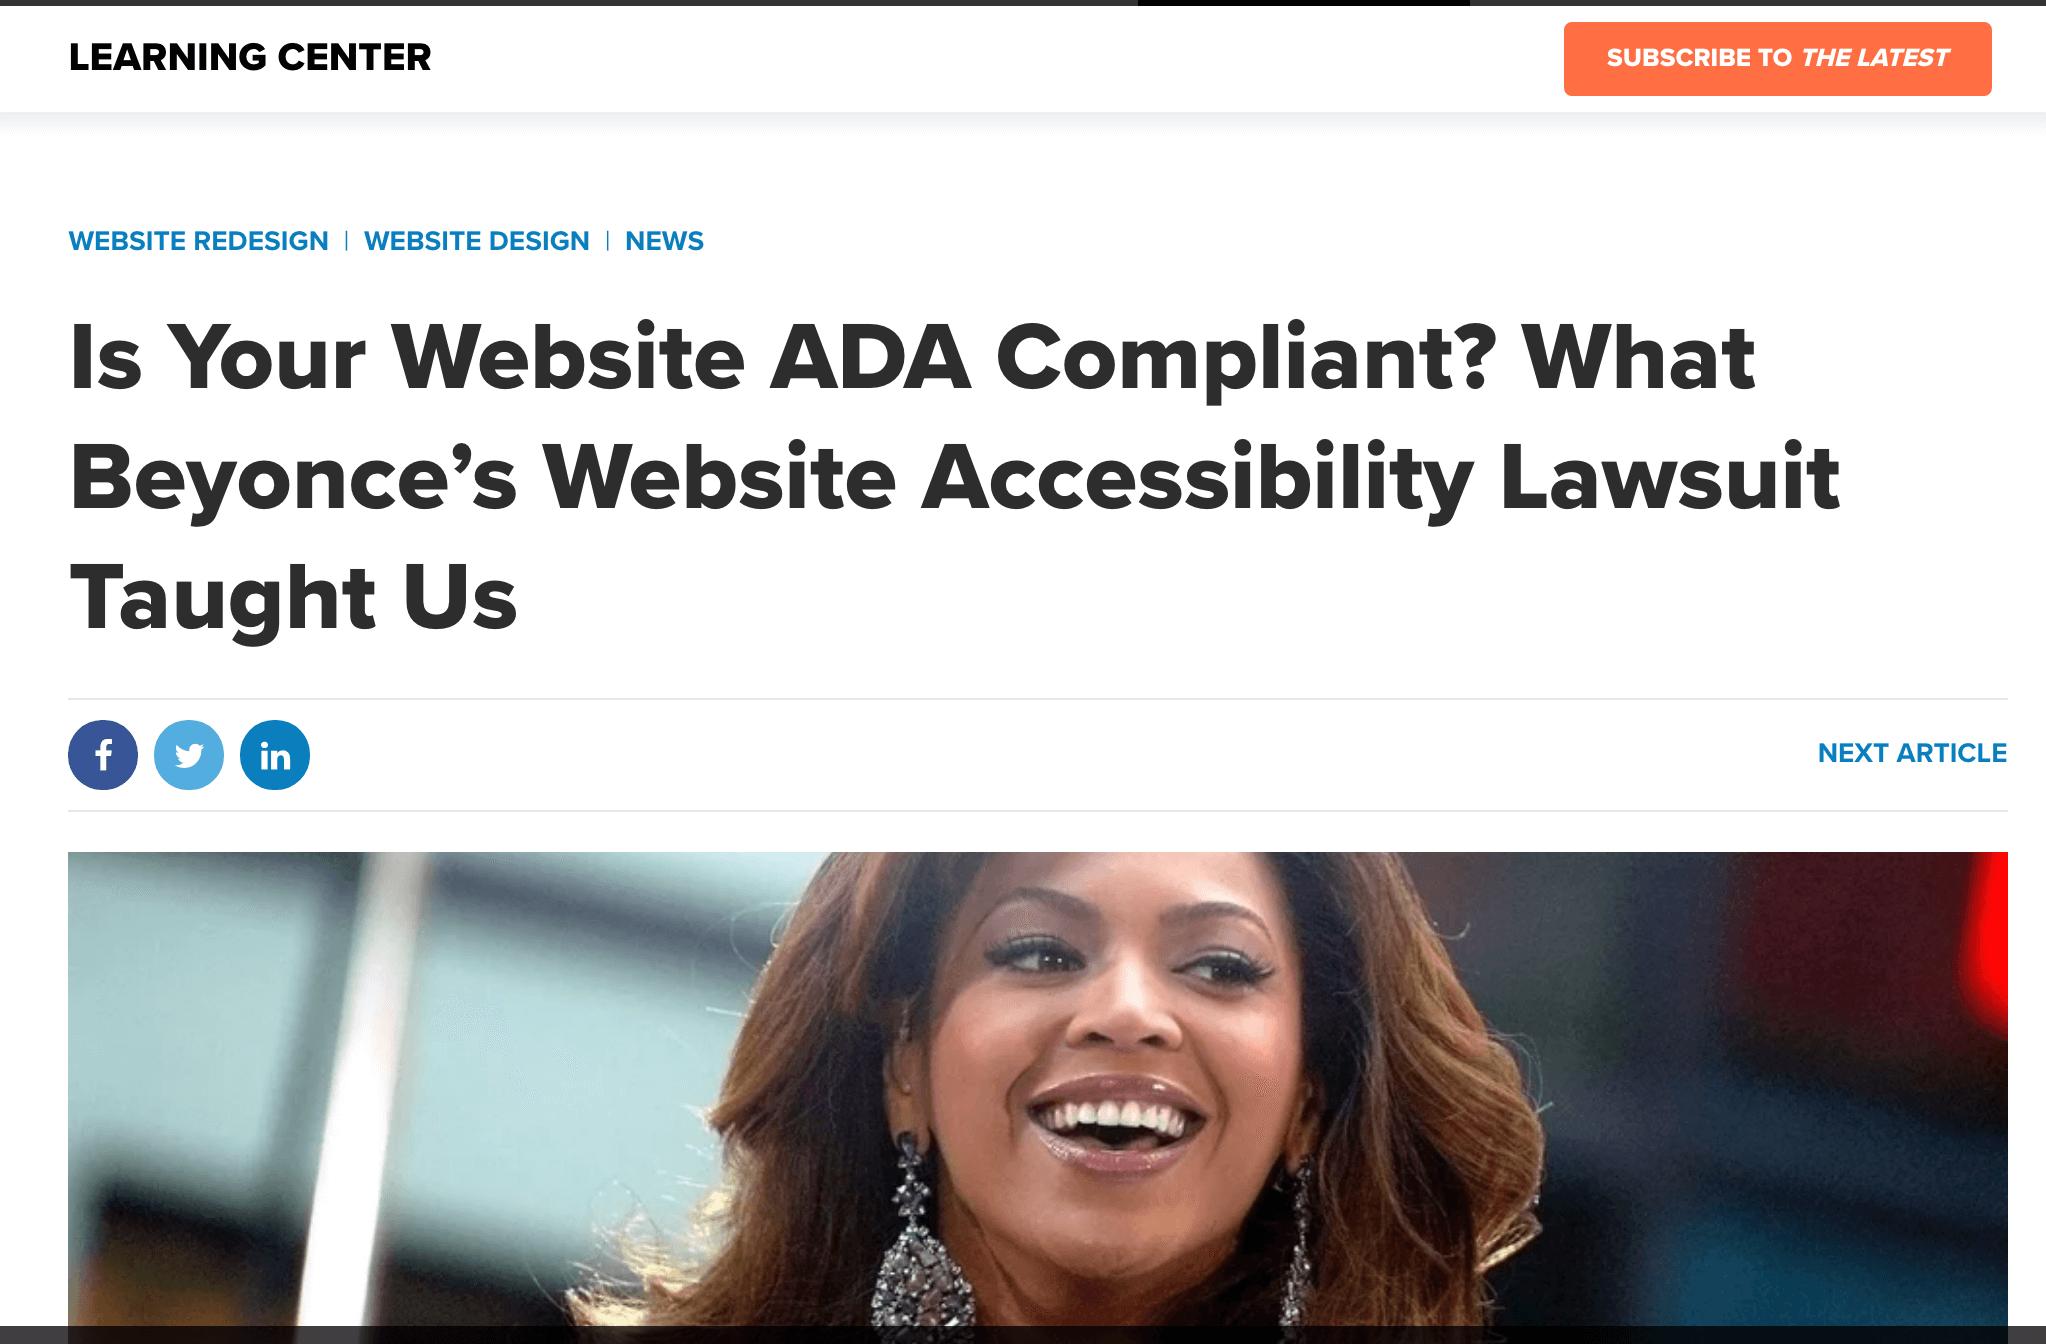 ADA Compliance Widget